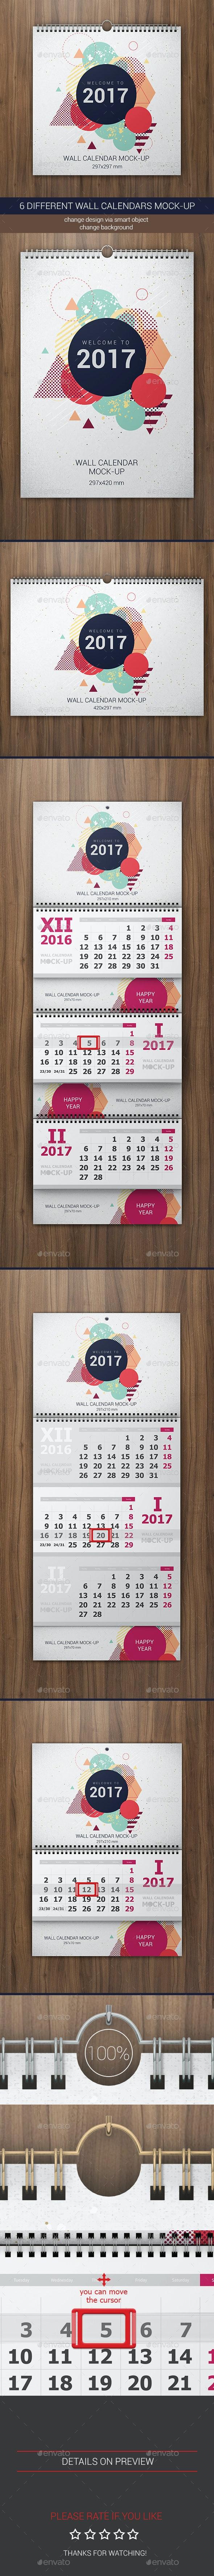 Wall Calendars Mock-Up - Miscellaneous Print